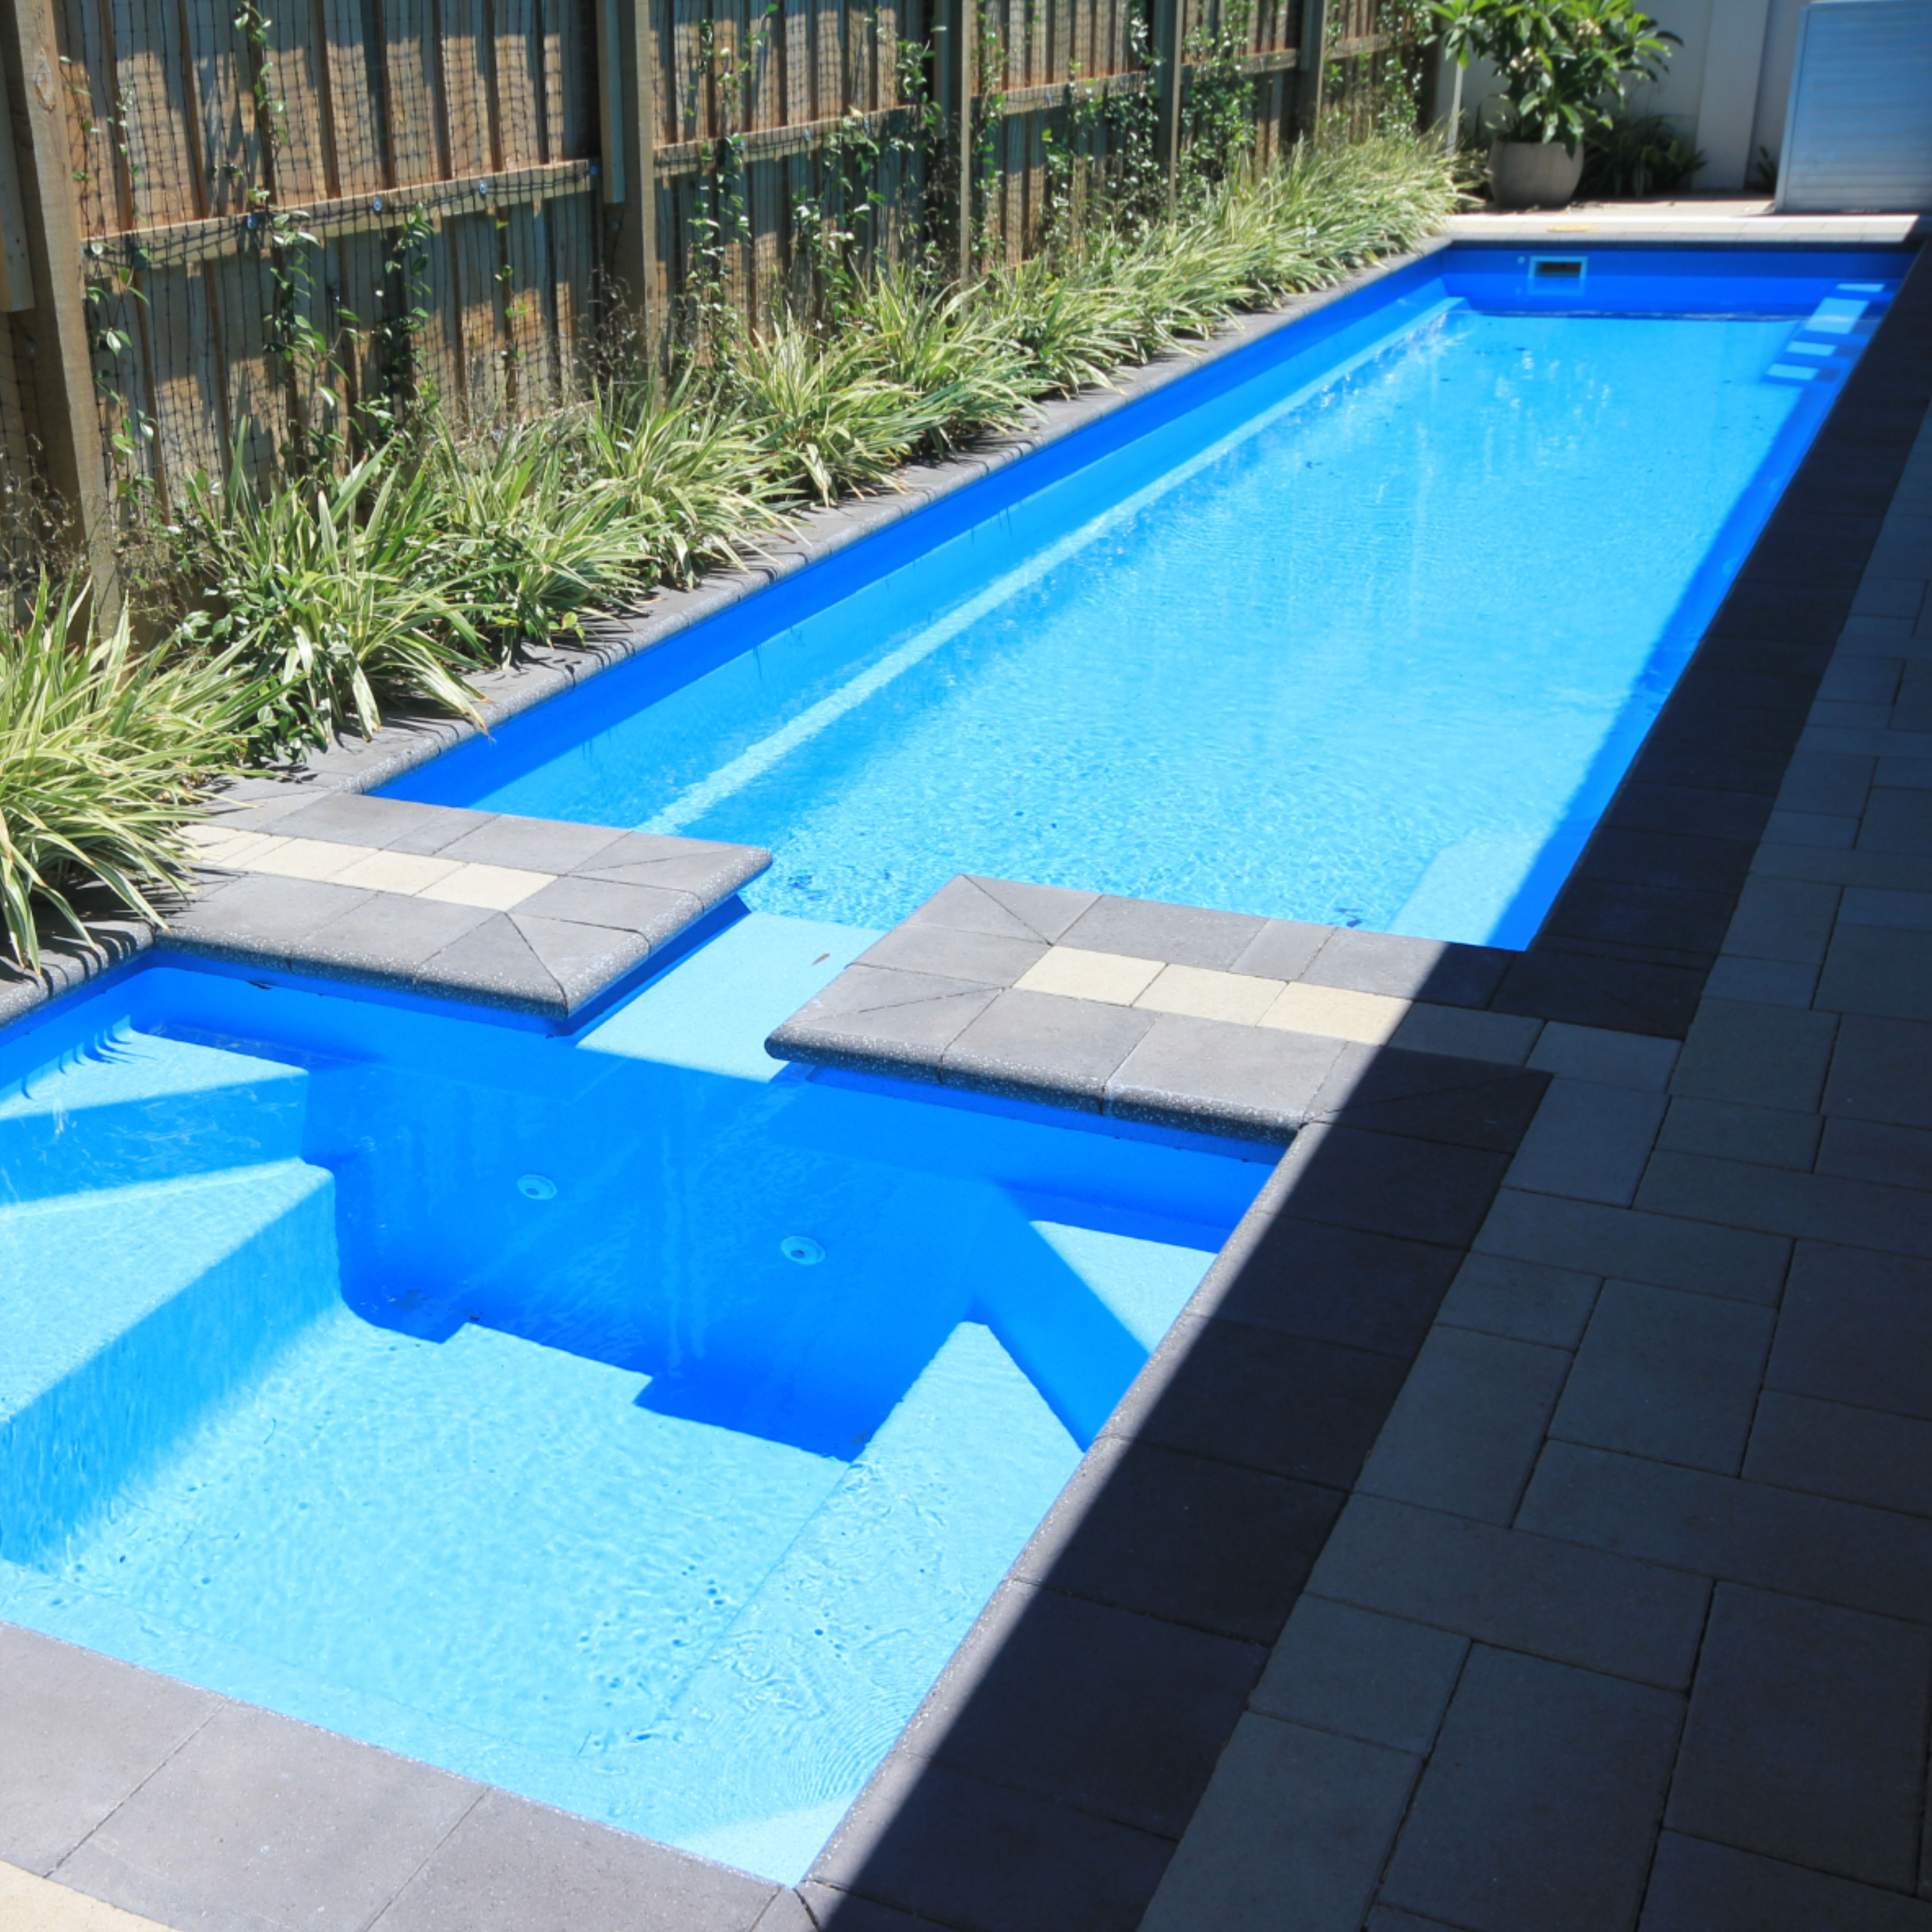 Pool Models Rectangular Swimming Pools Fiberglass Pools Pool